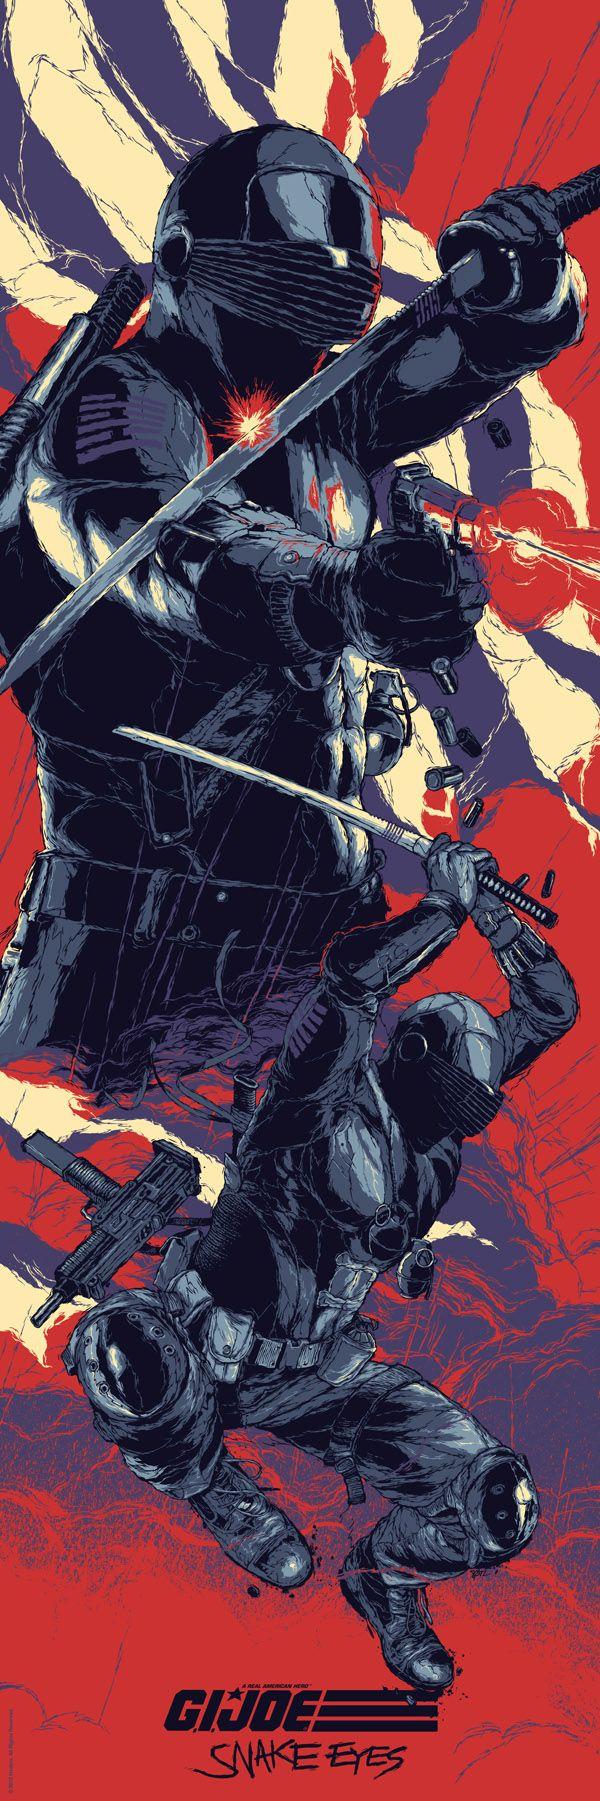 Cool G.I. JOE Art Featuring Snake Eyes, Cobra Commander, Storm Shadow, andDuke - News - GeekTyrant